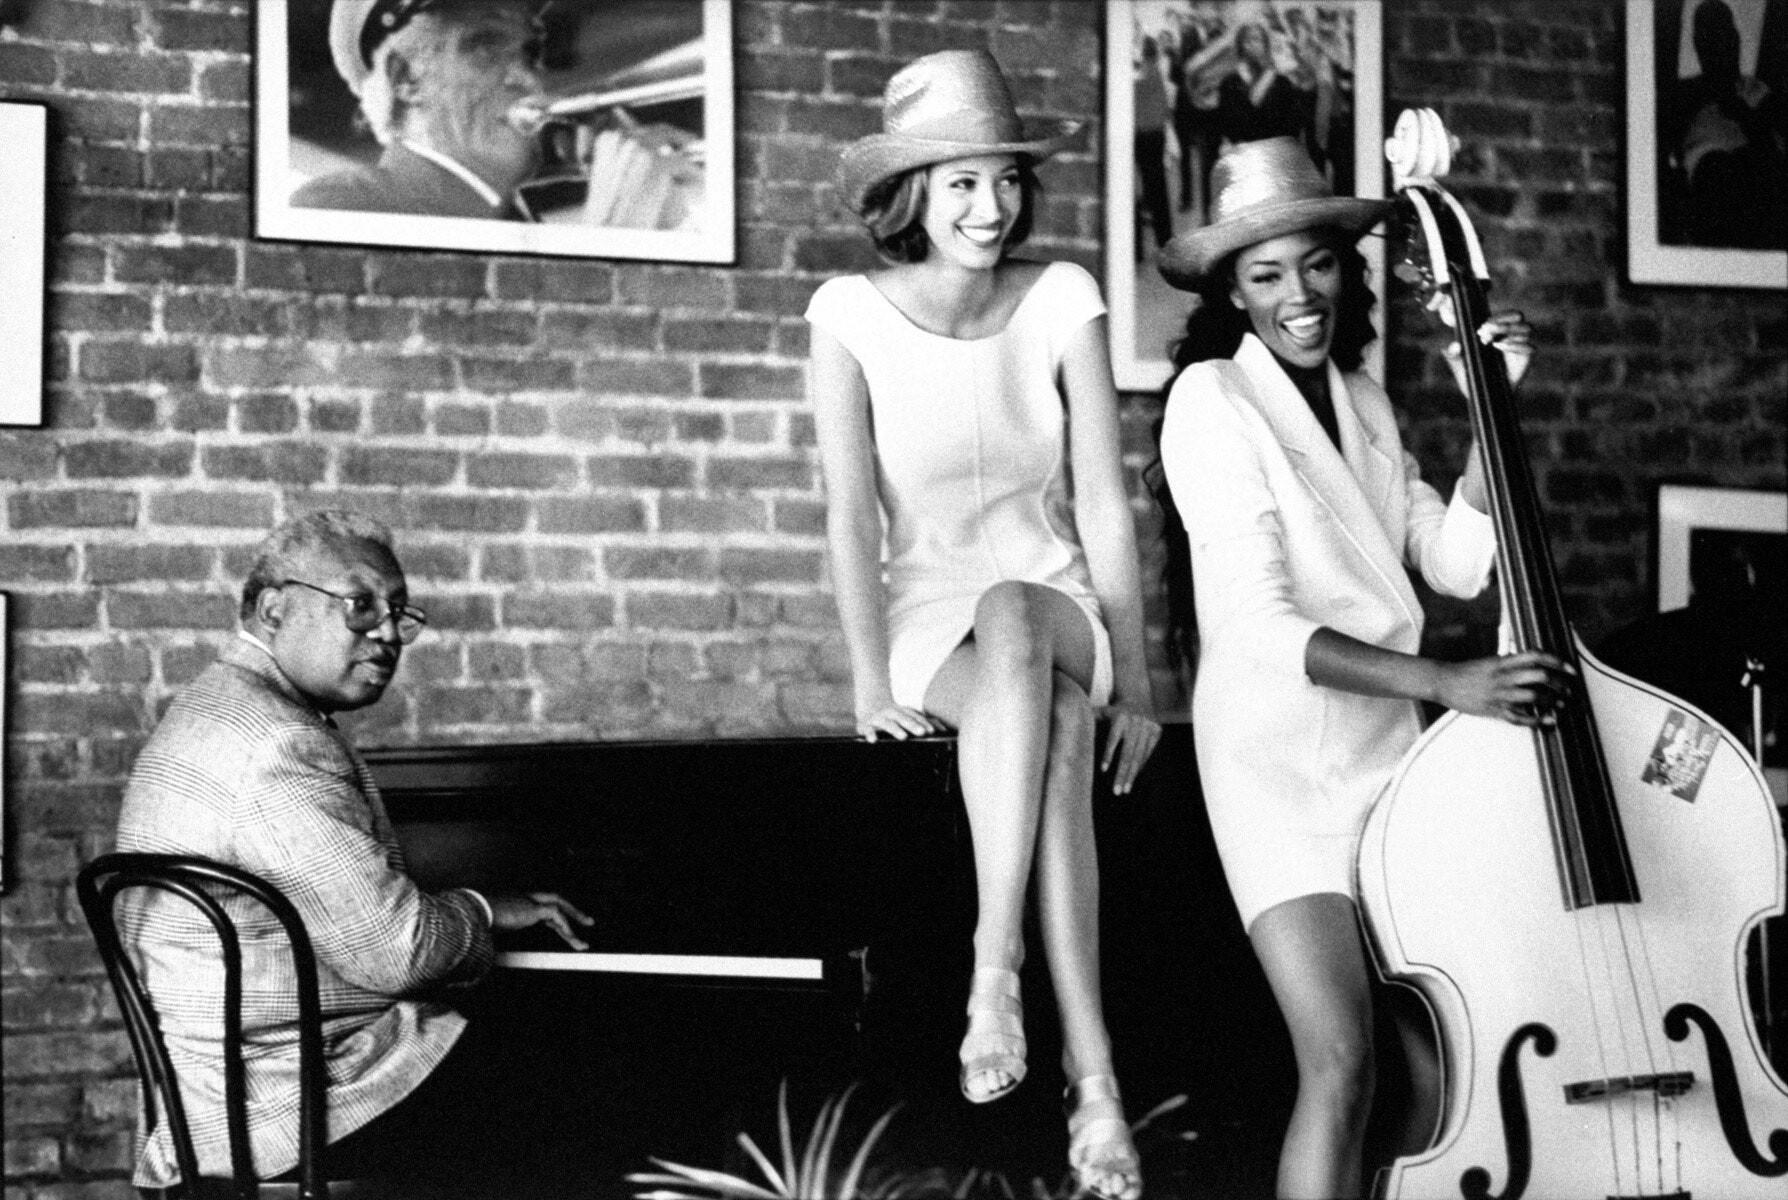 Эллис Луи Марсалис-младший, Кристи Тарлингтон и Наоми Кэмпбелл в Луизиане, Vogue, 1992. Автор Артур Элгорт